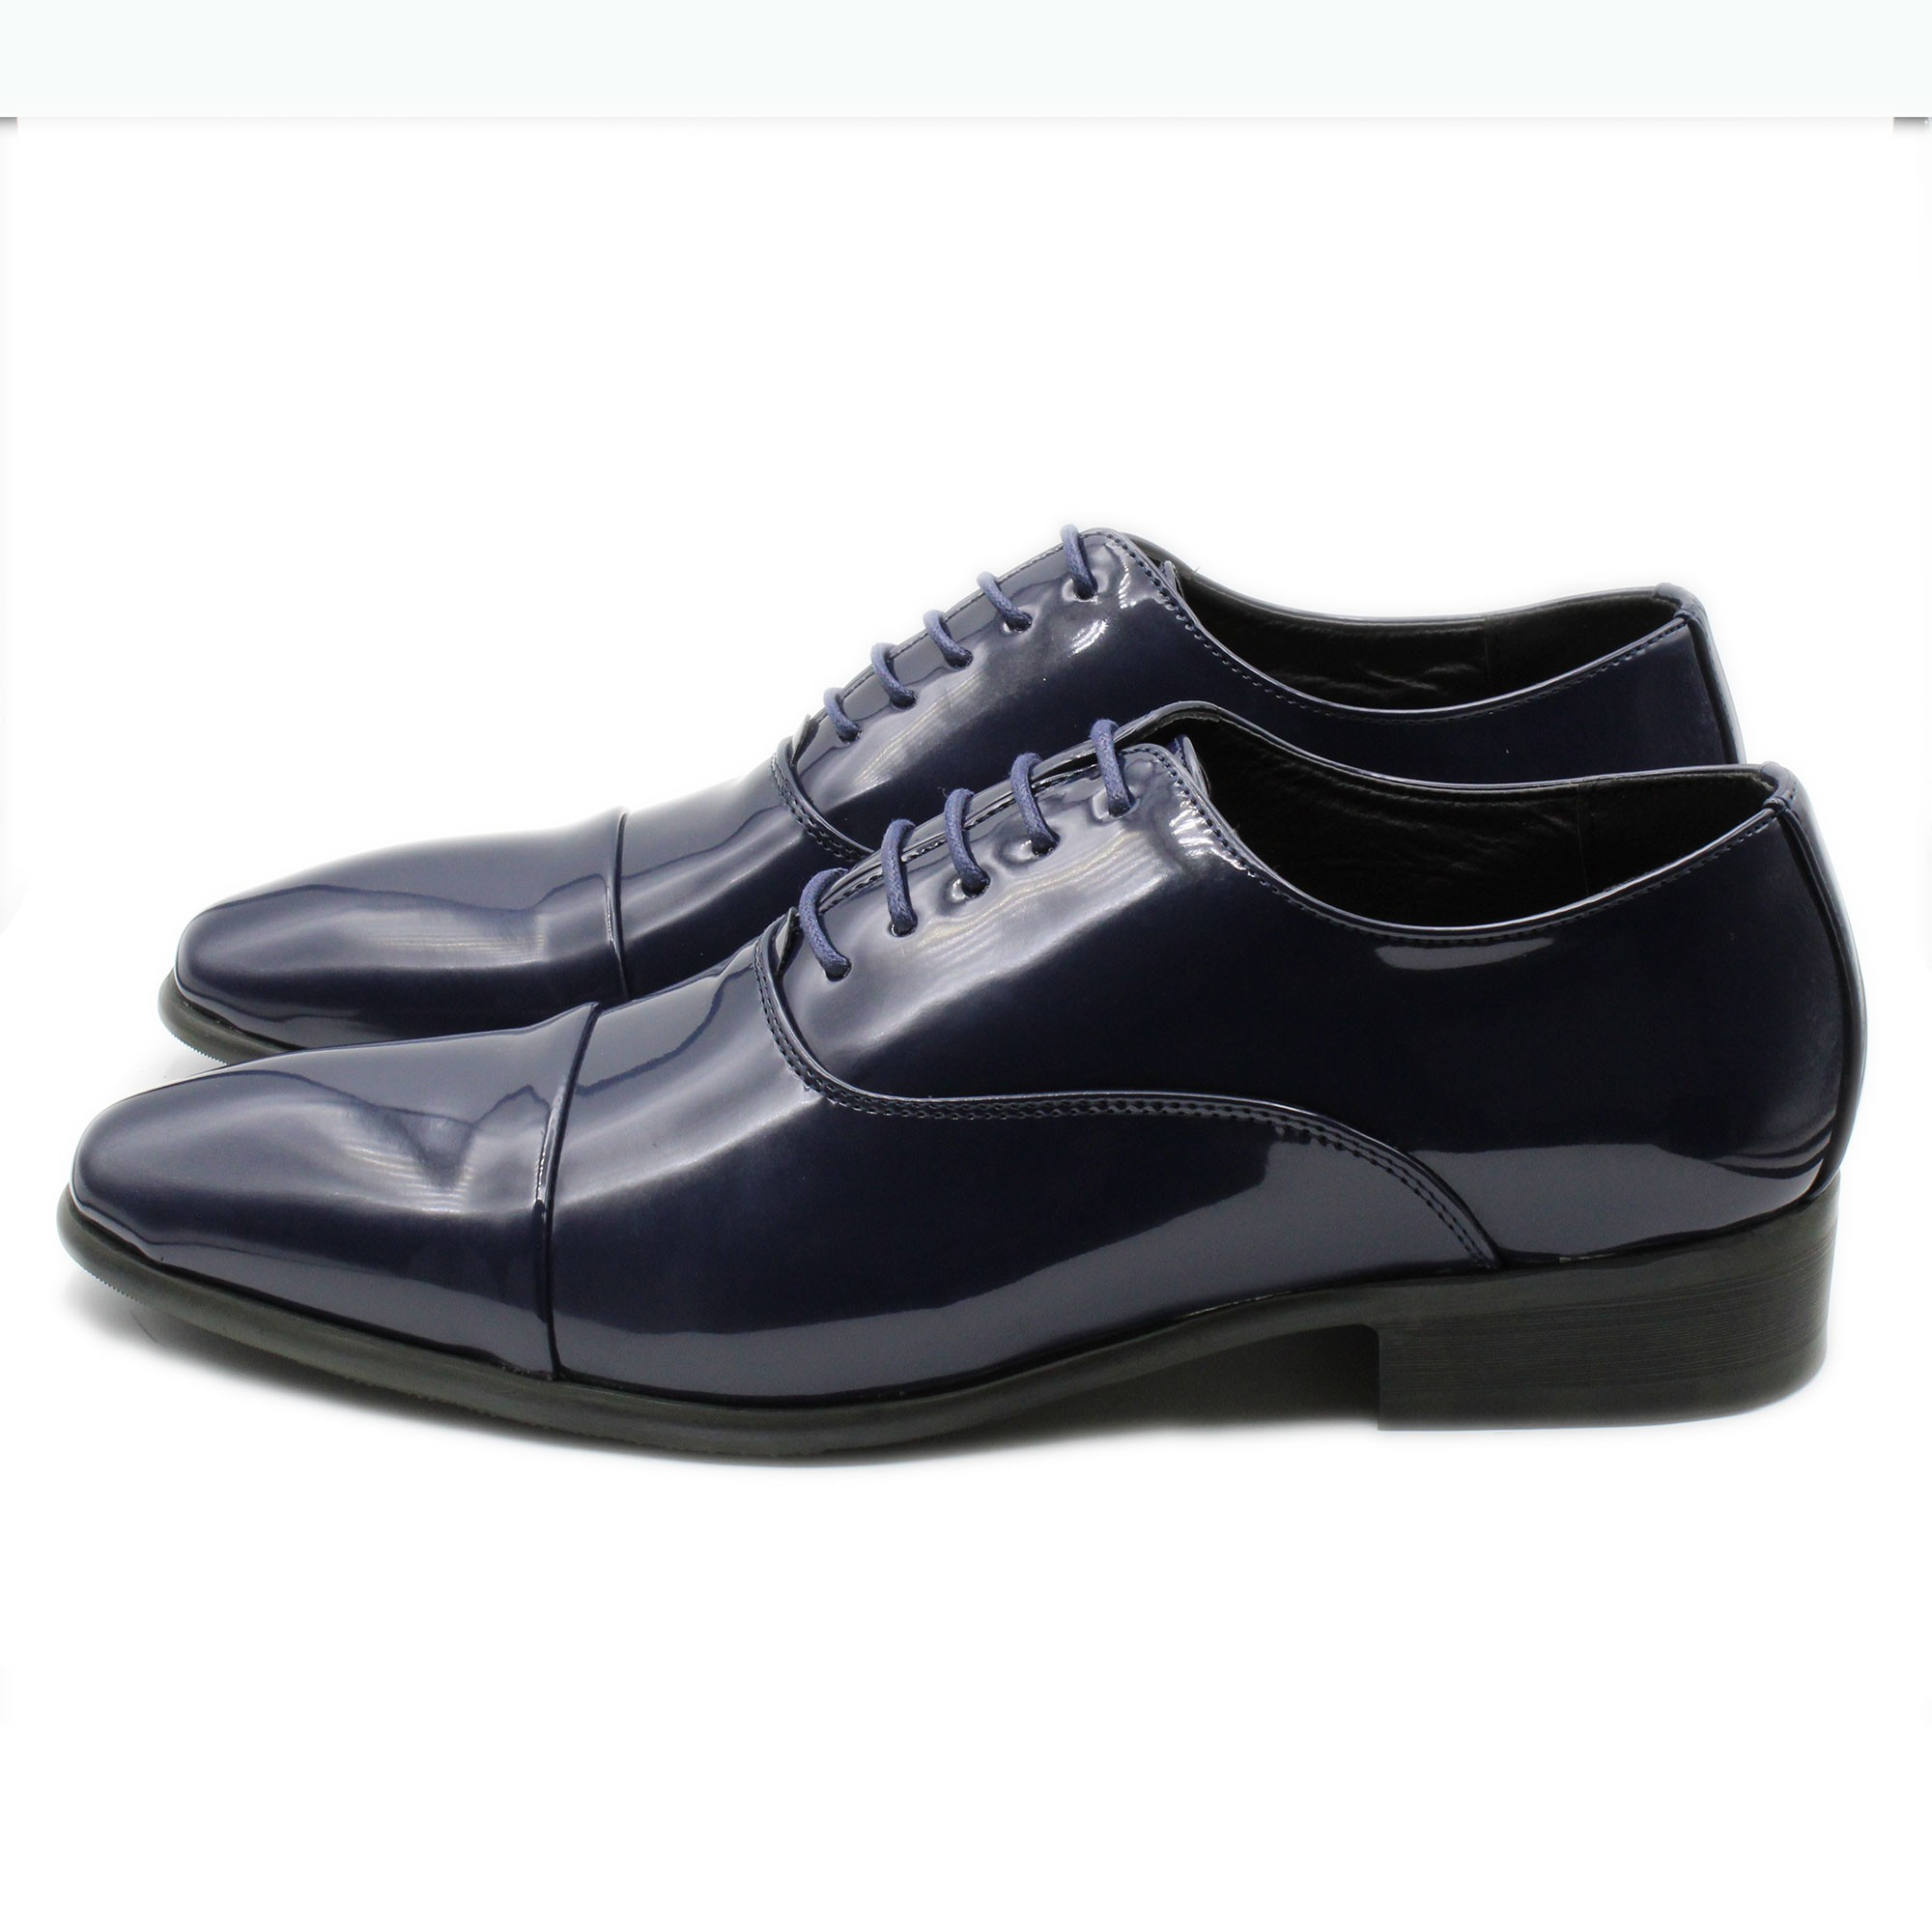 Scarpe-Uomo-Eleganti-Lucide-Blu-Estive-Francesine-Classiche-Cerimonia-Oxford miniatura 3